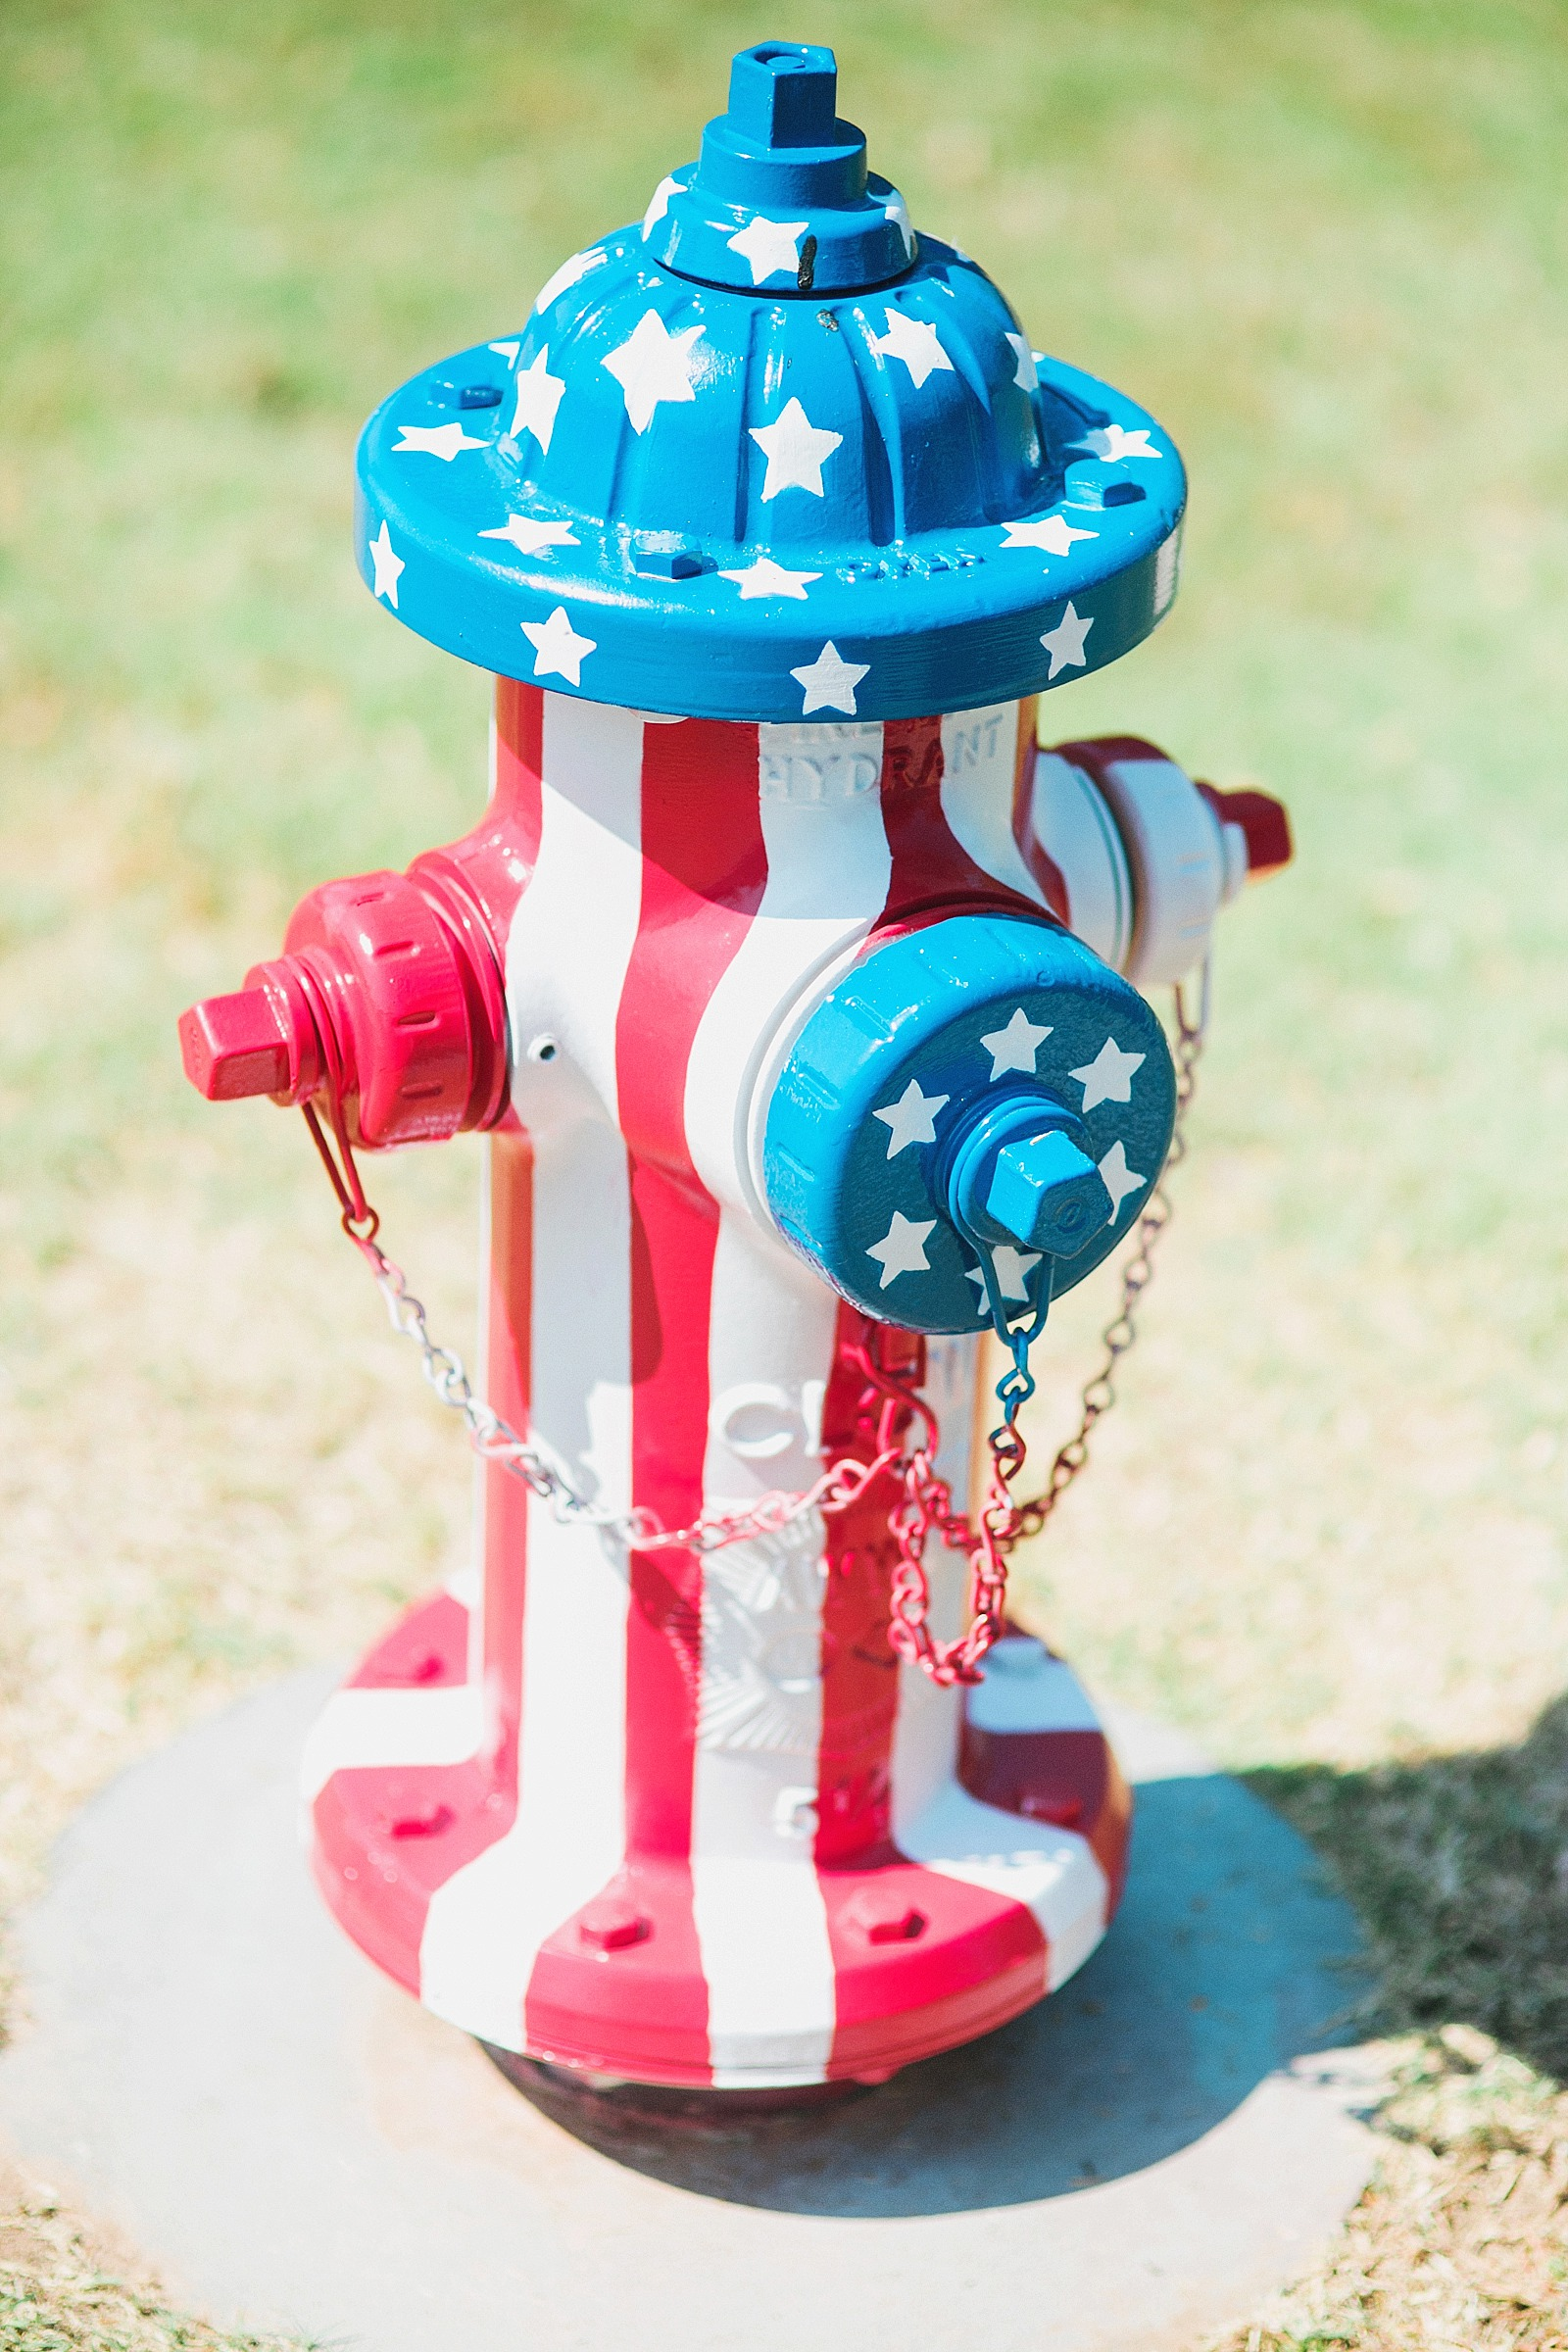 american-flag-fire-hydrant-painted-artistic-lifestyle-blogger-diana-elizabeth-blog-arizona-fashion-pool-summer-time_0102